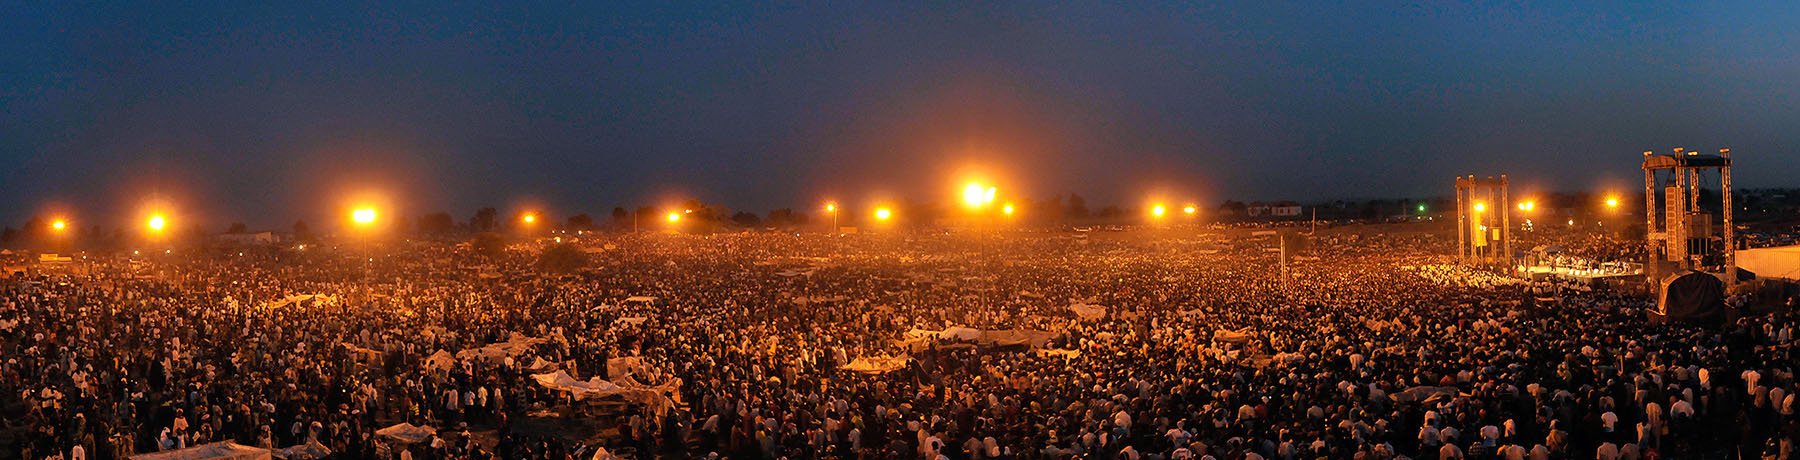 The Crowd Doubles Numan Nigeria Day 2 Daniel Kolenda